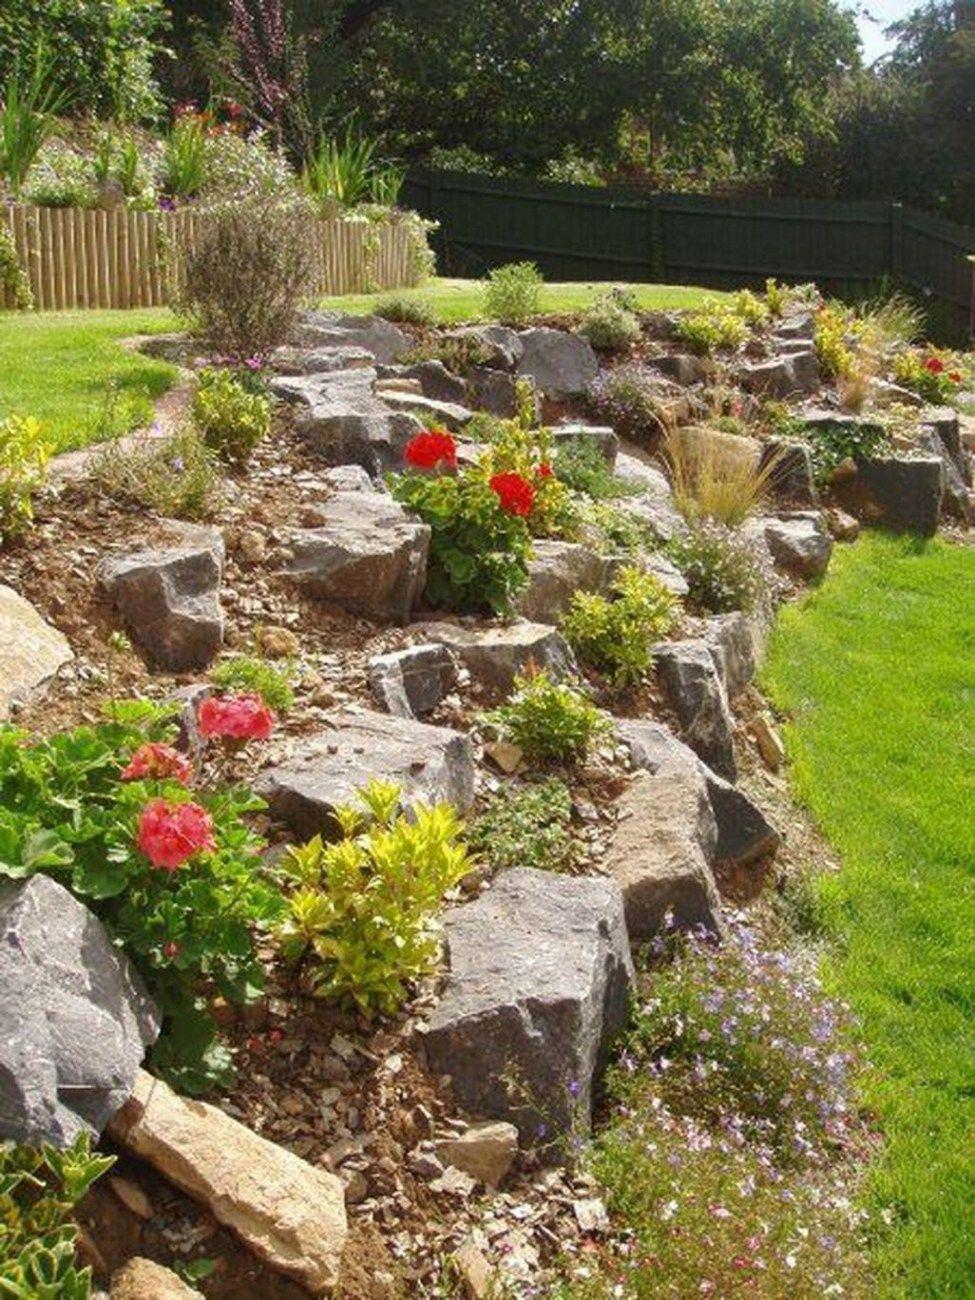 50 Low Maintenance Front Yard Landscaping Ideas 50homedesign Com Rock Garden Design Rock Garden Landscaping Sloped Backyard